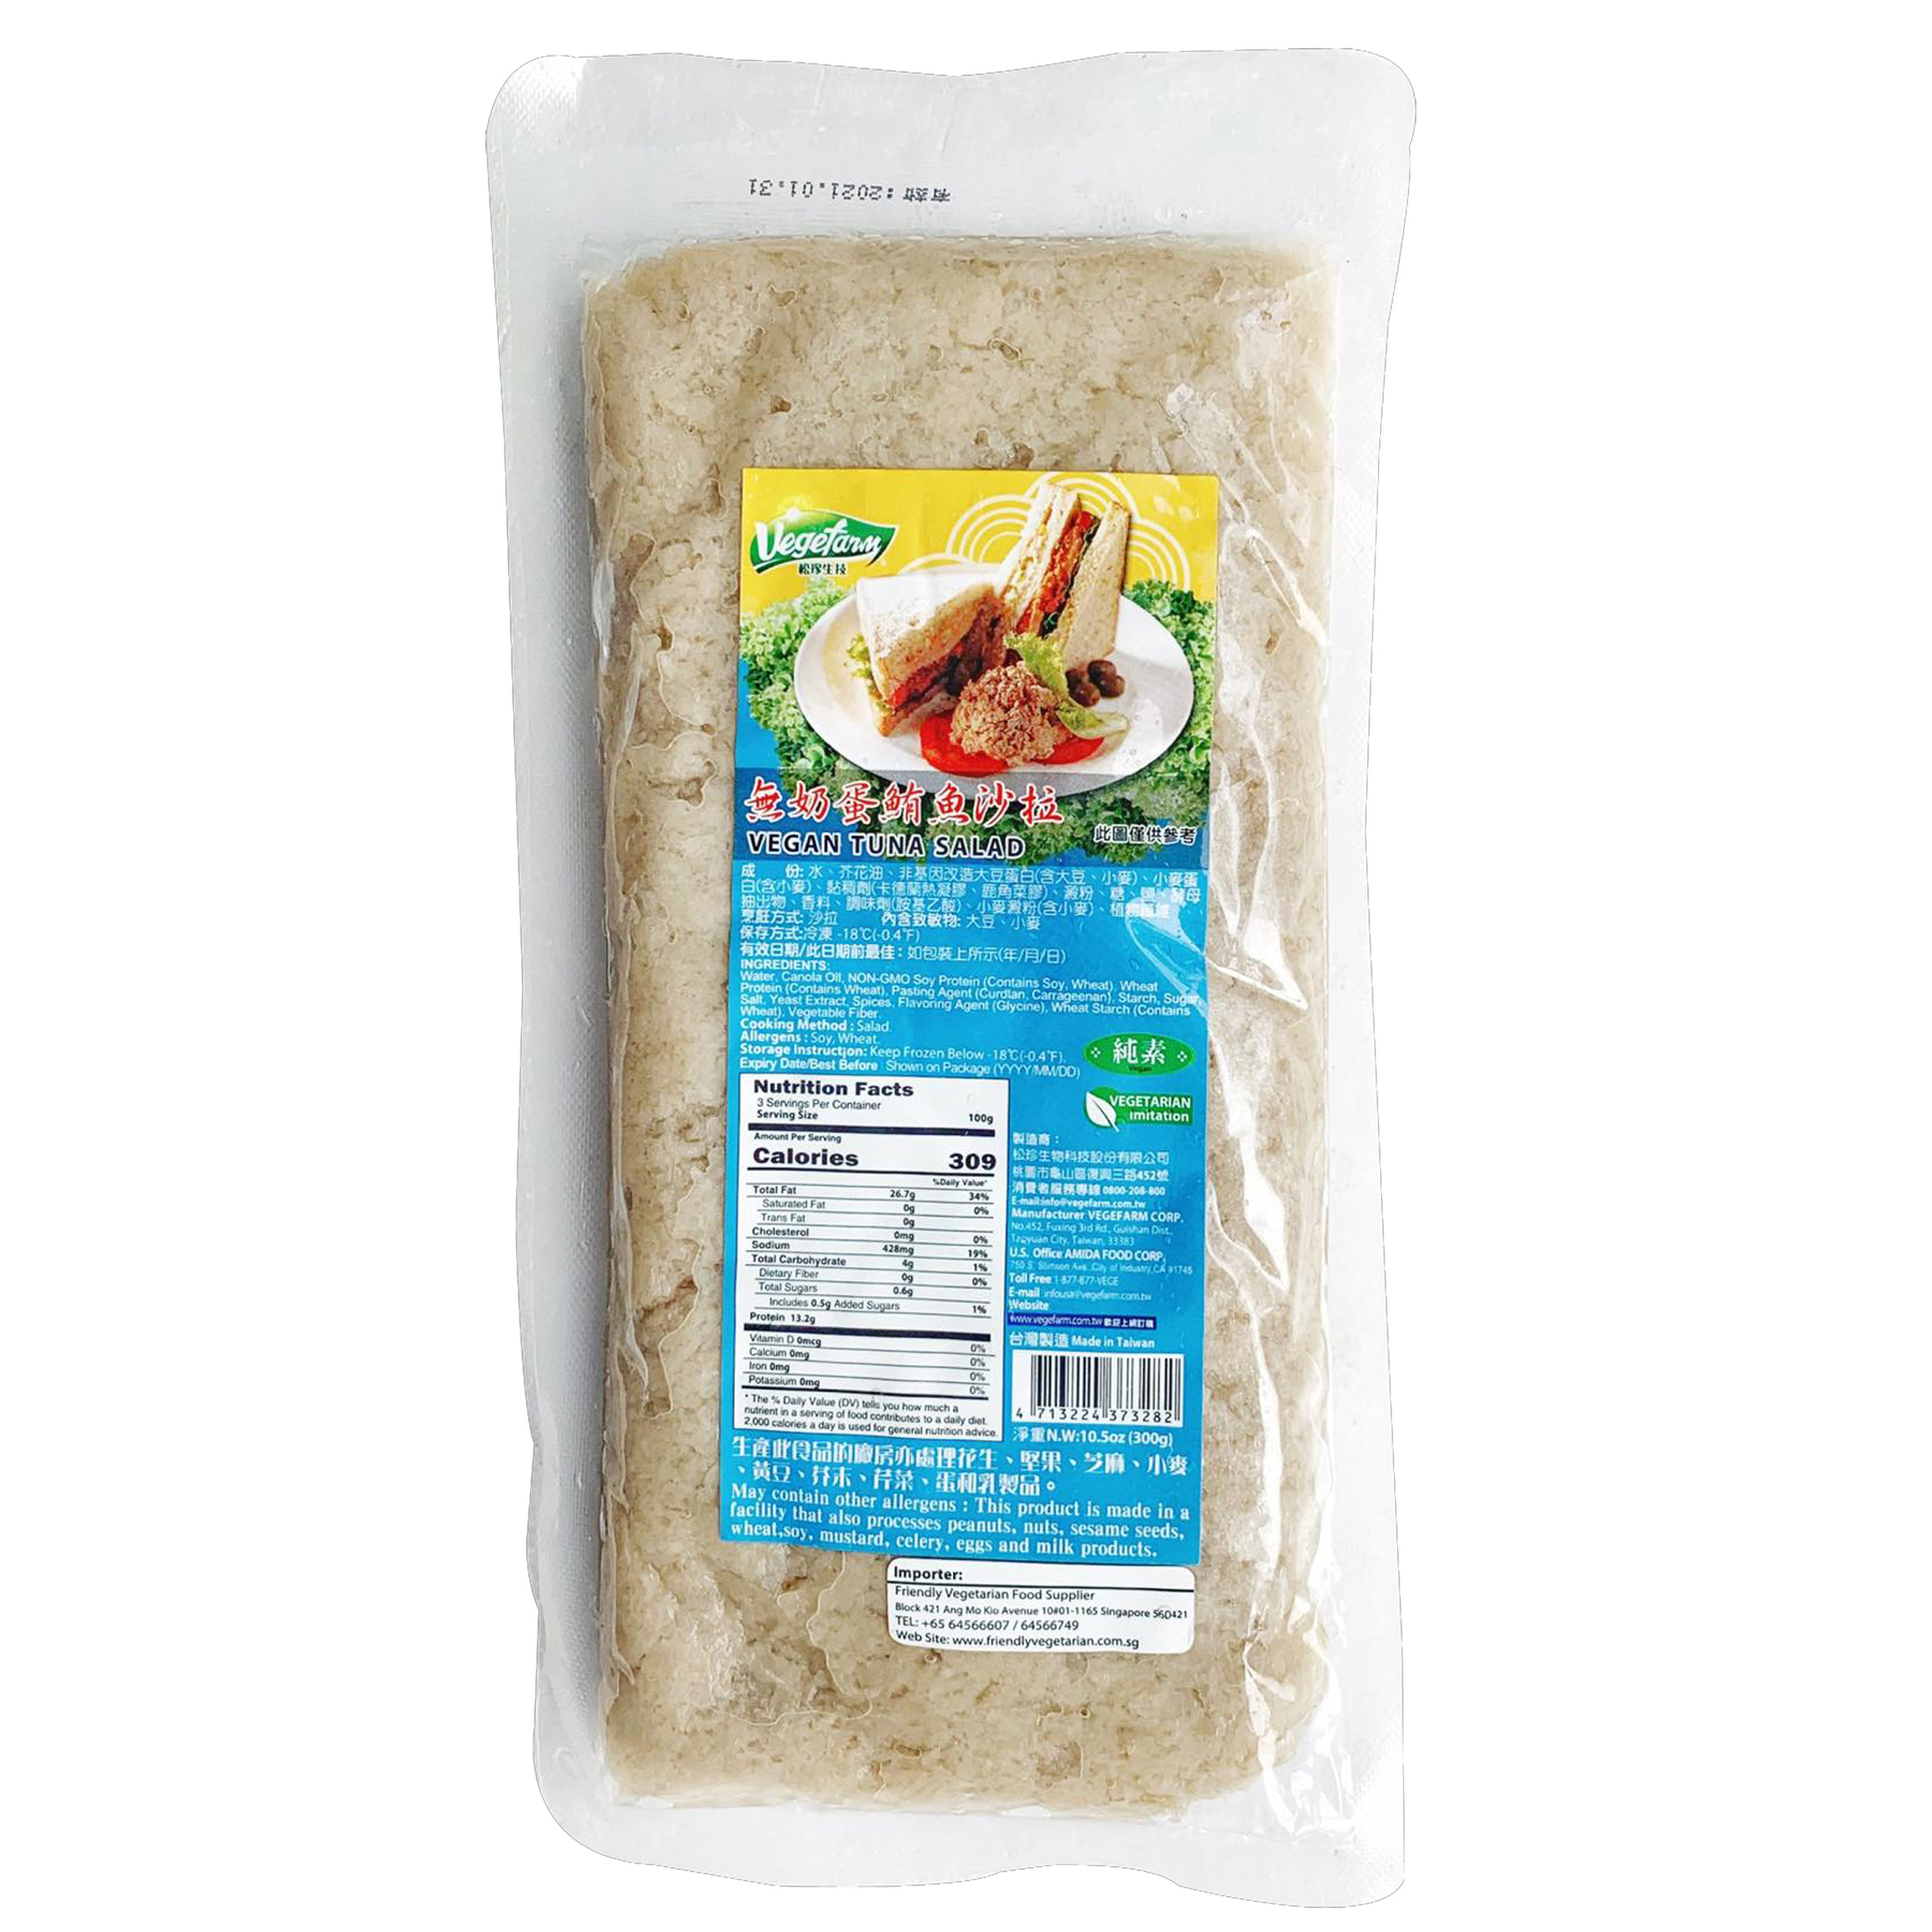 Image SZ Vegefarm Vegan Tuna Salad 松珍 - 无奶蛋鲔鱼沙拉 300grams